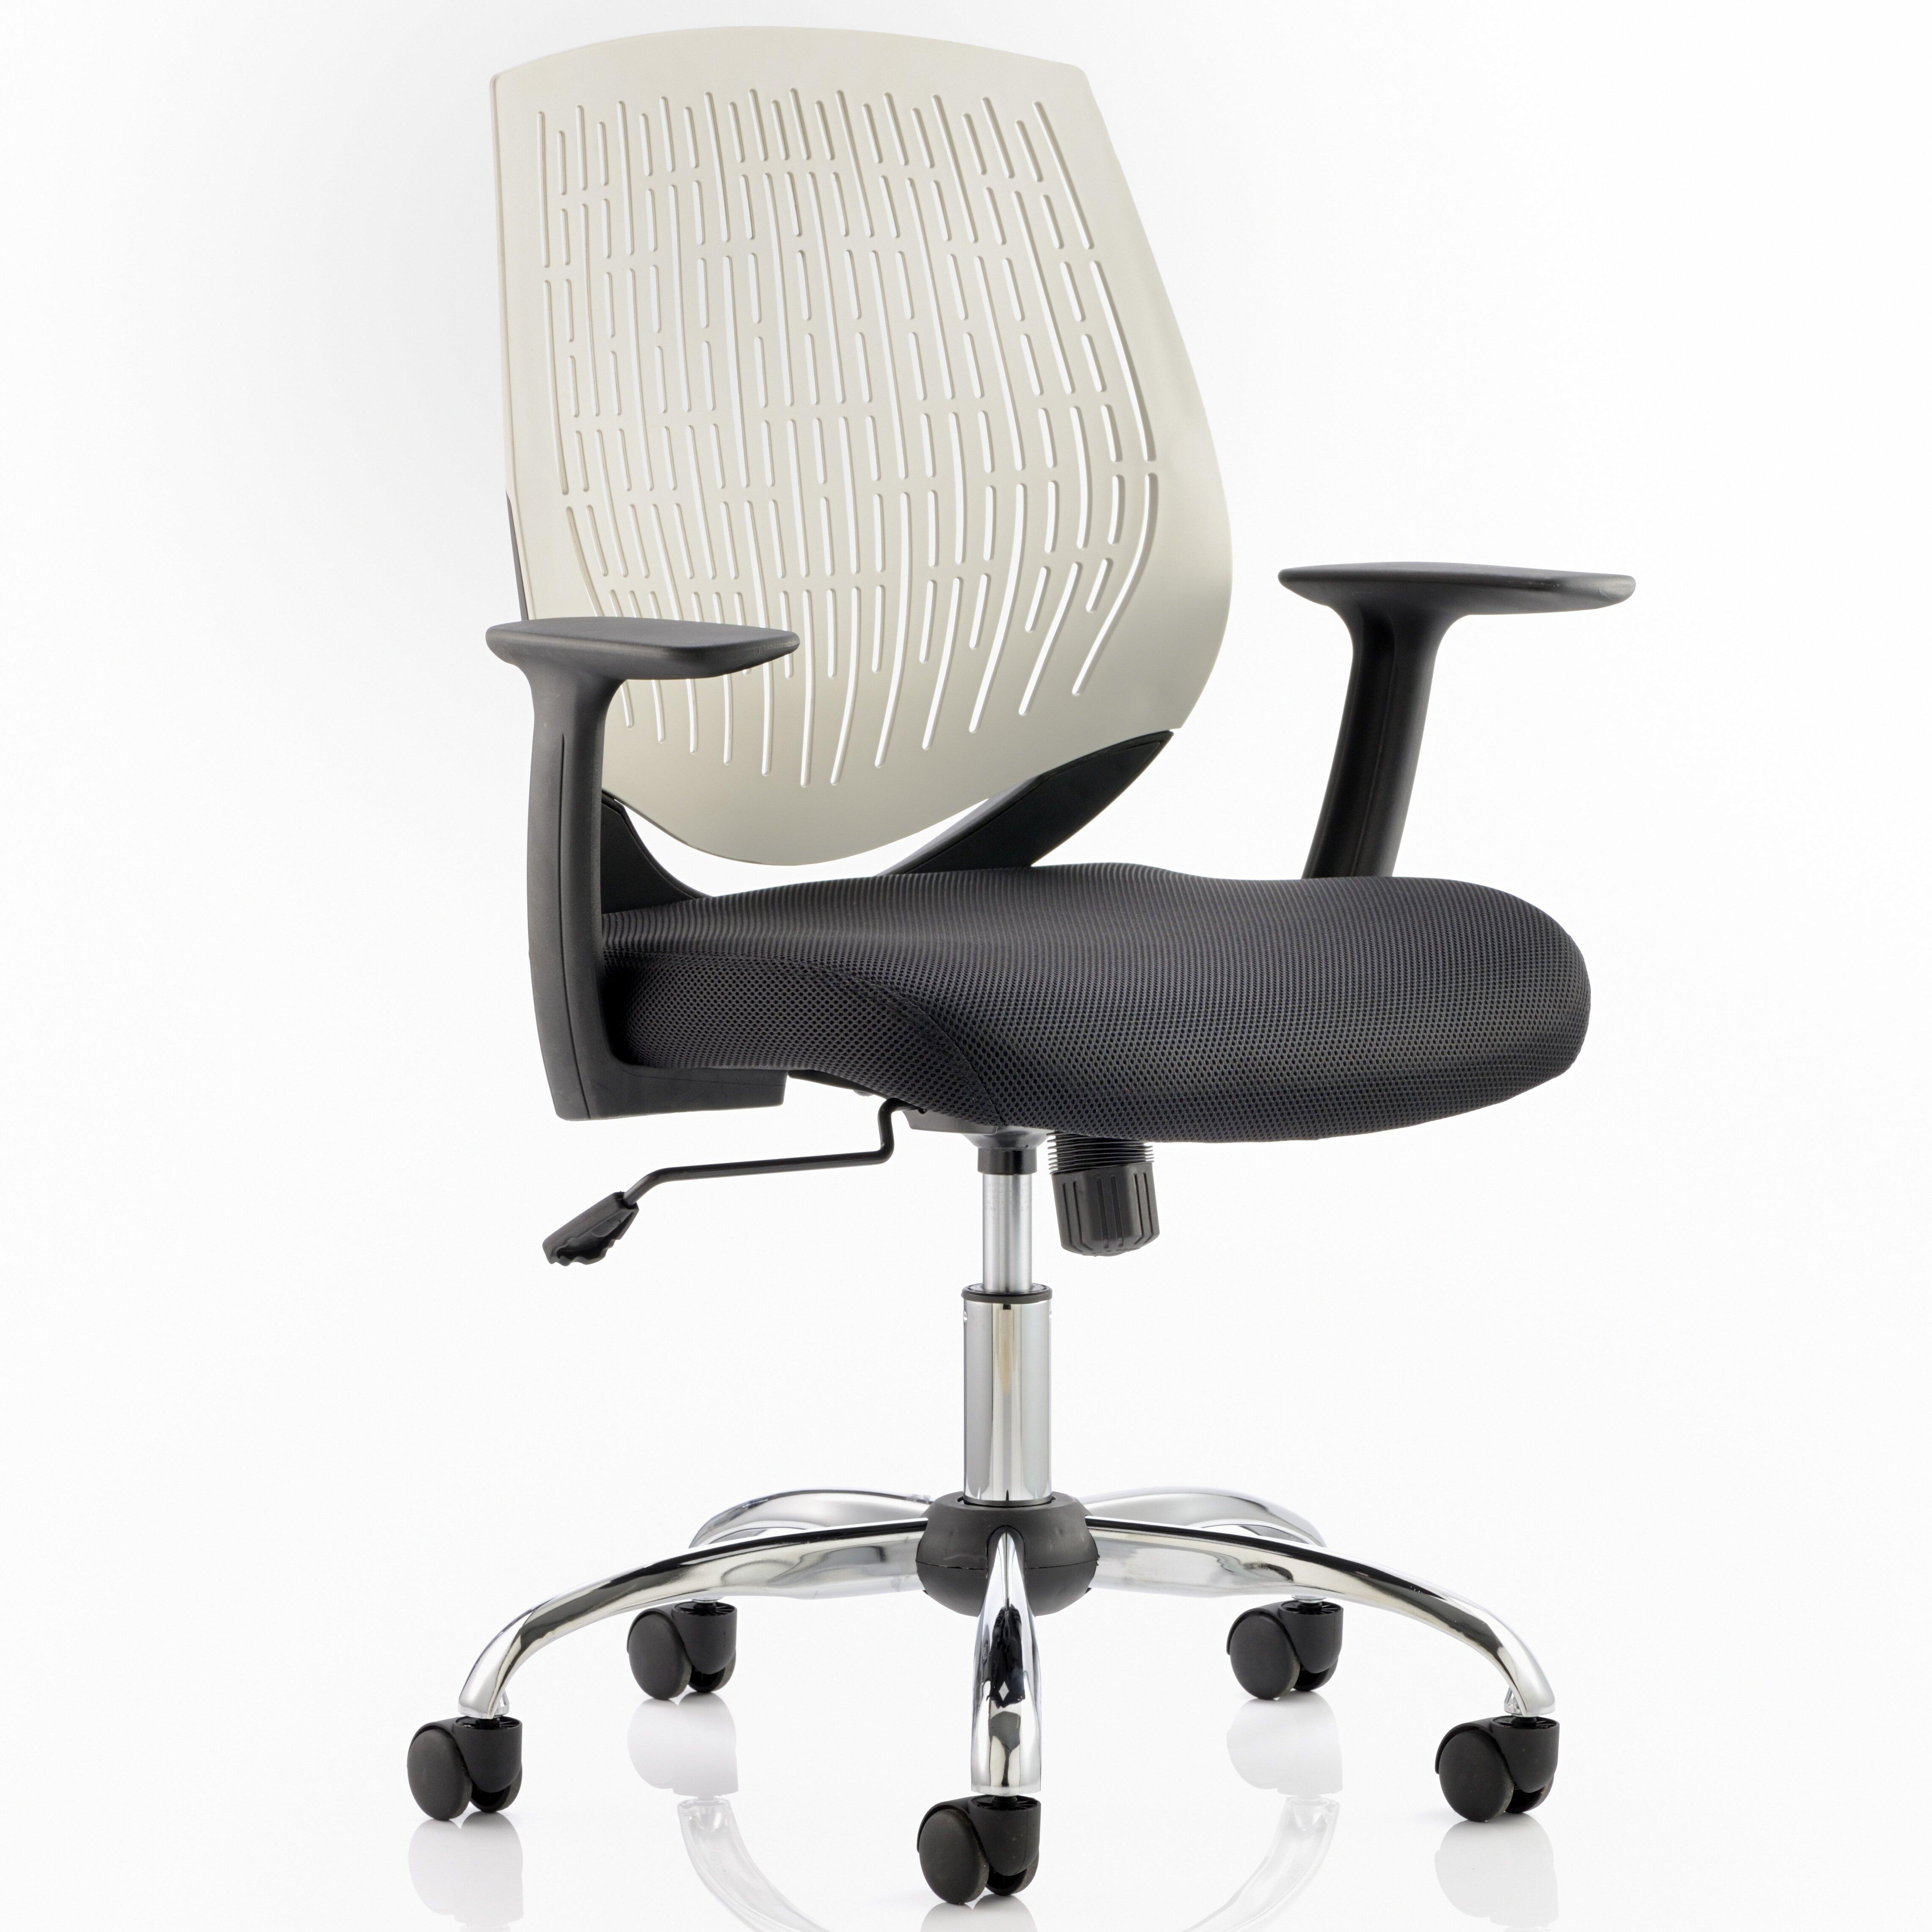 Symple Stuff Mid Back Mesh Desk Chair